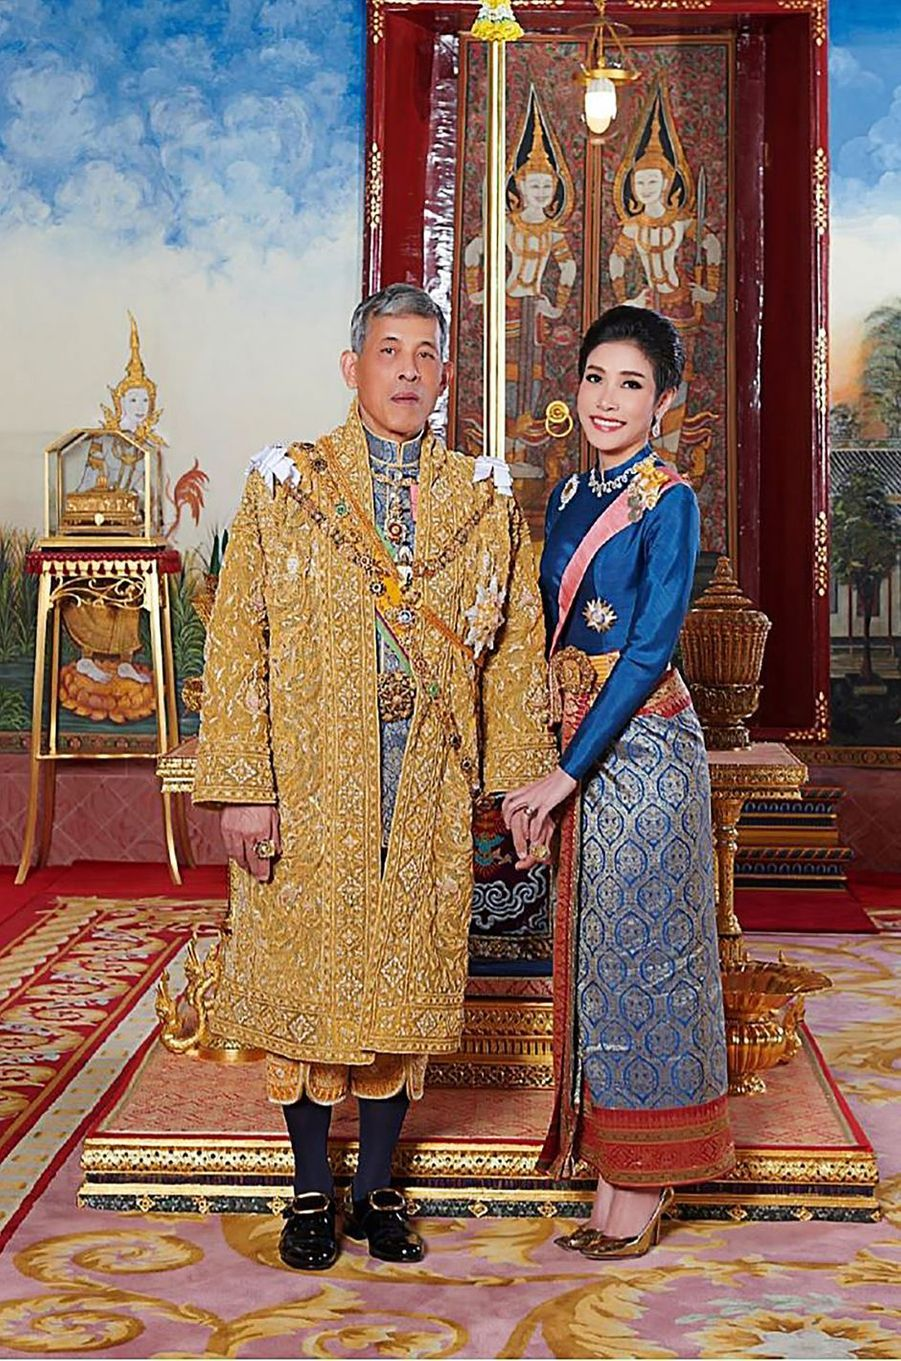 Le roi de Thaïlande Maha Vajiralongkorn (Rama X) et Sineenat Bilaskalayani, sa concubine officielle. Photo diffusée le 26 août 2019